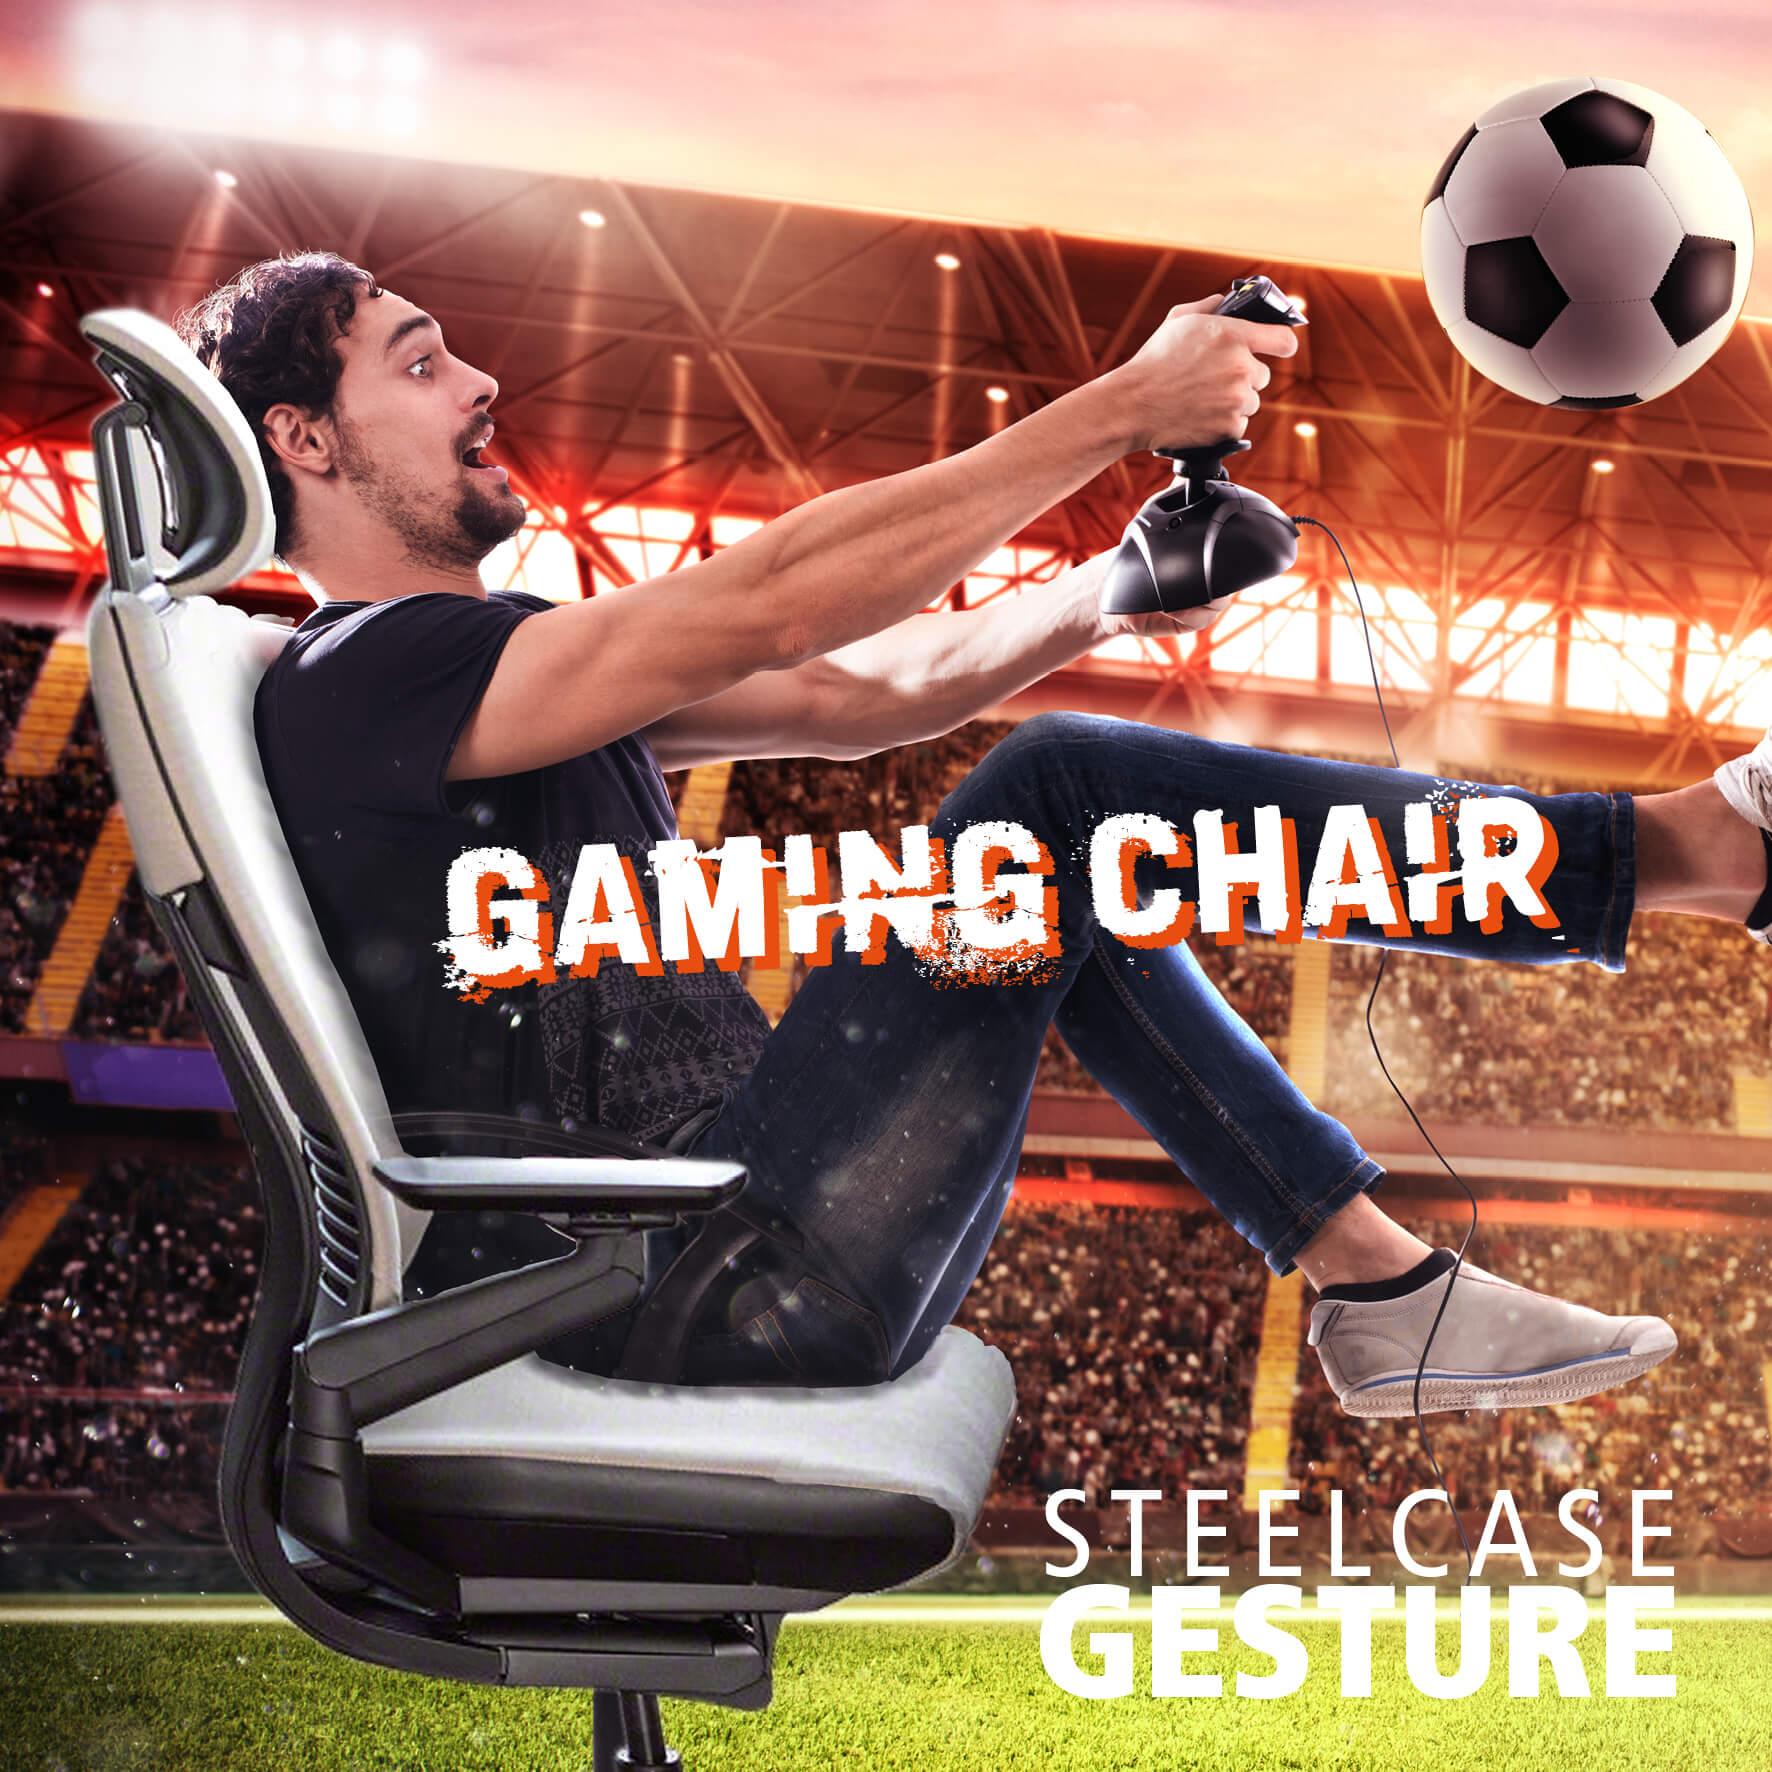 Gaming-Chair-ProduktbildXlEgIU6Xtk5Ss